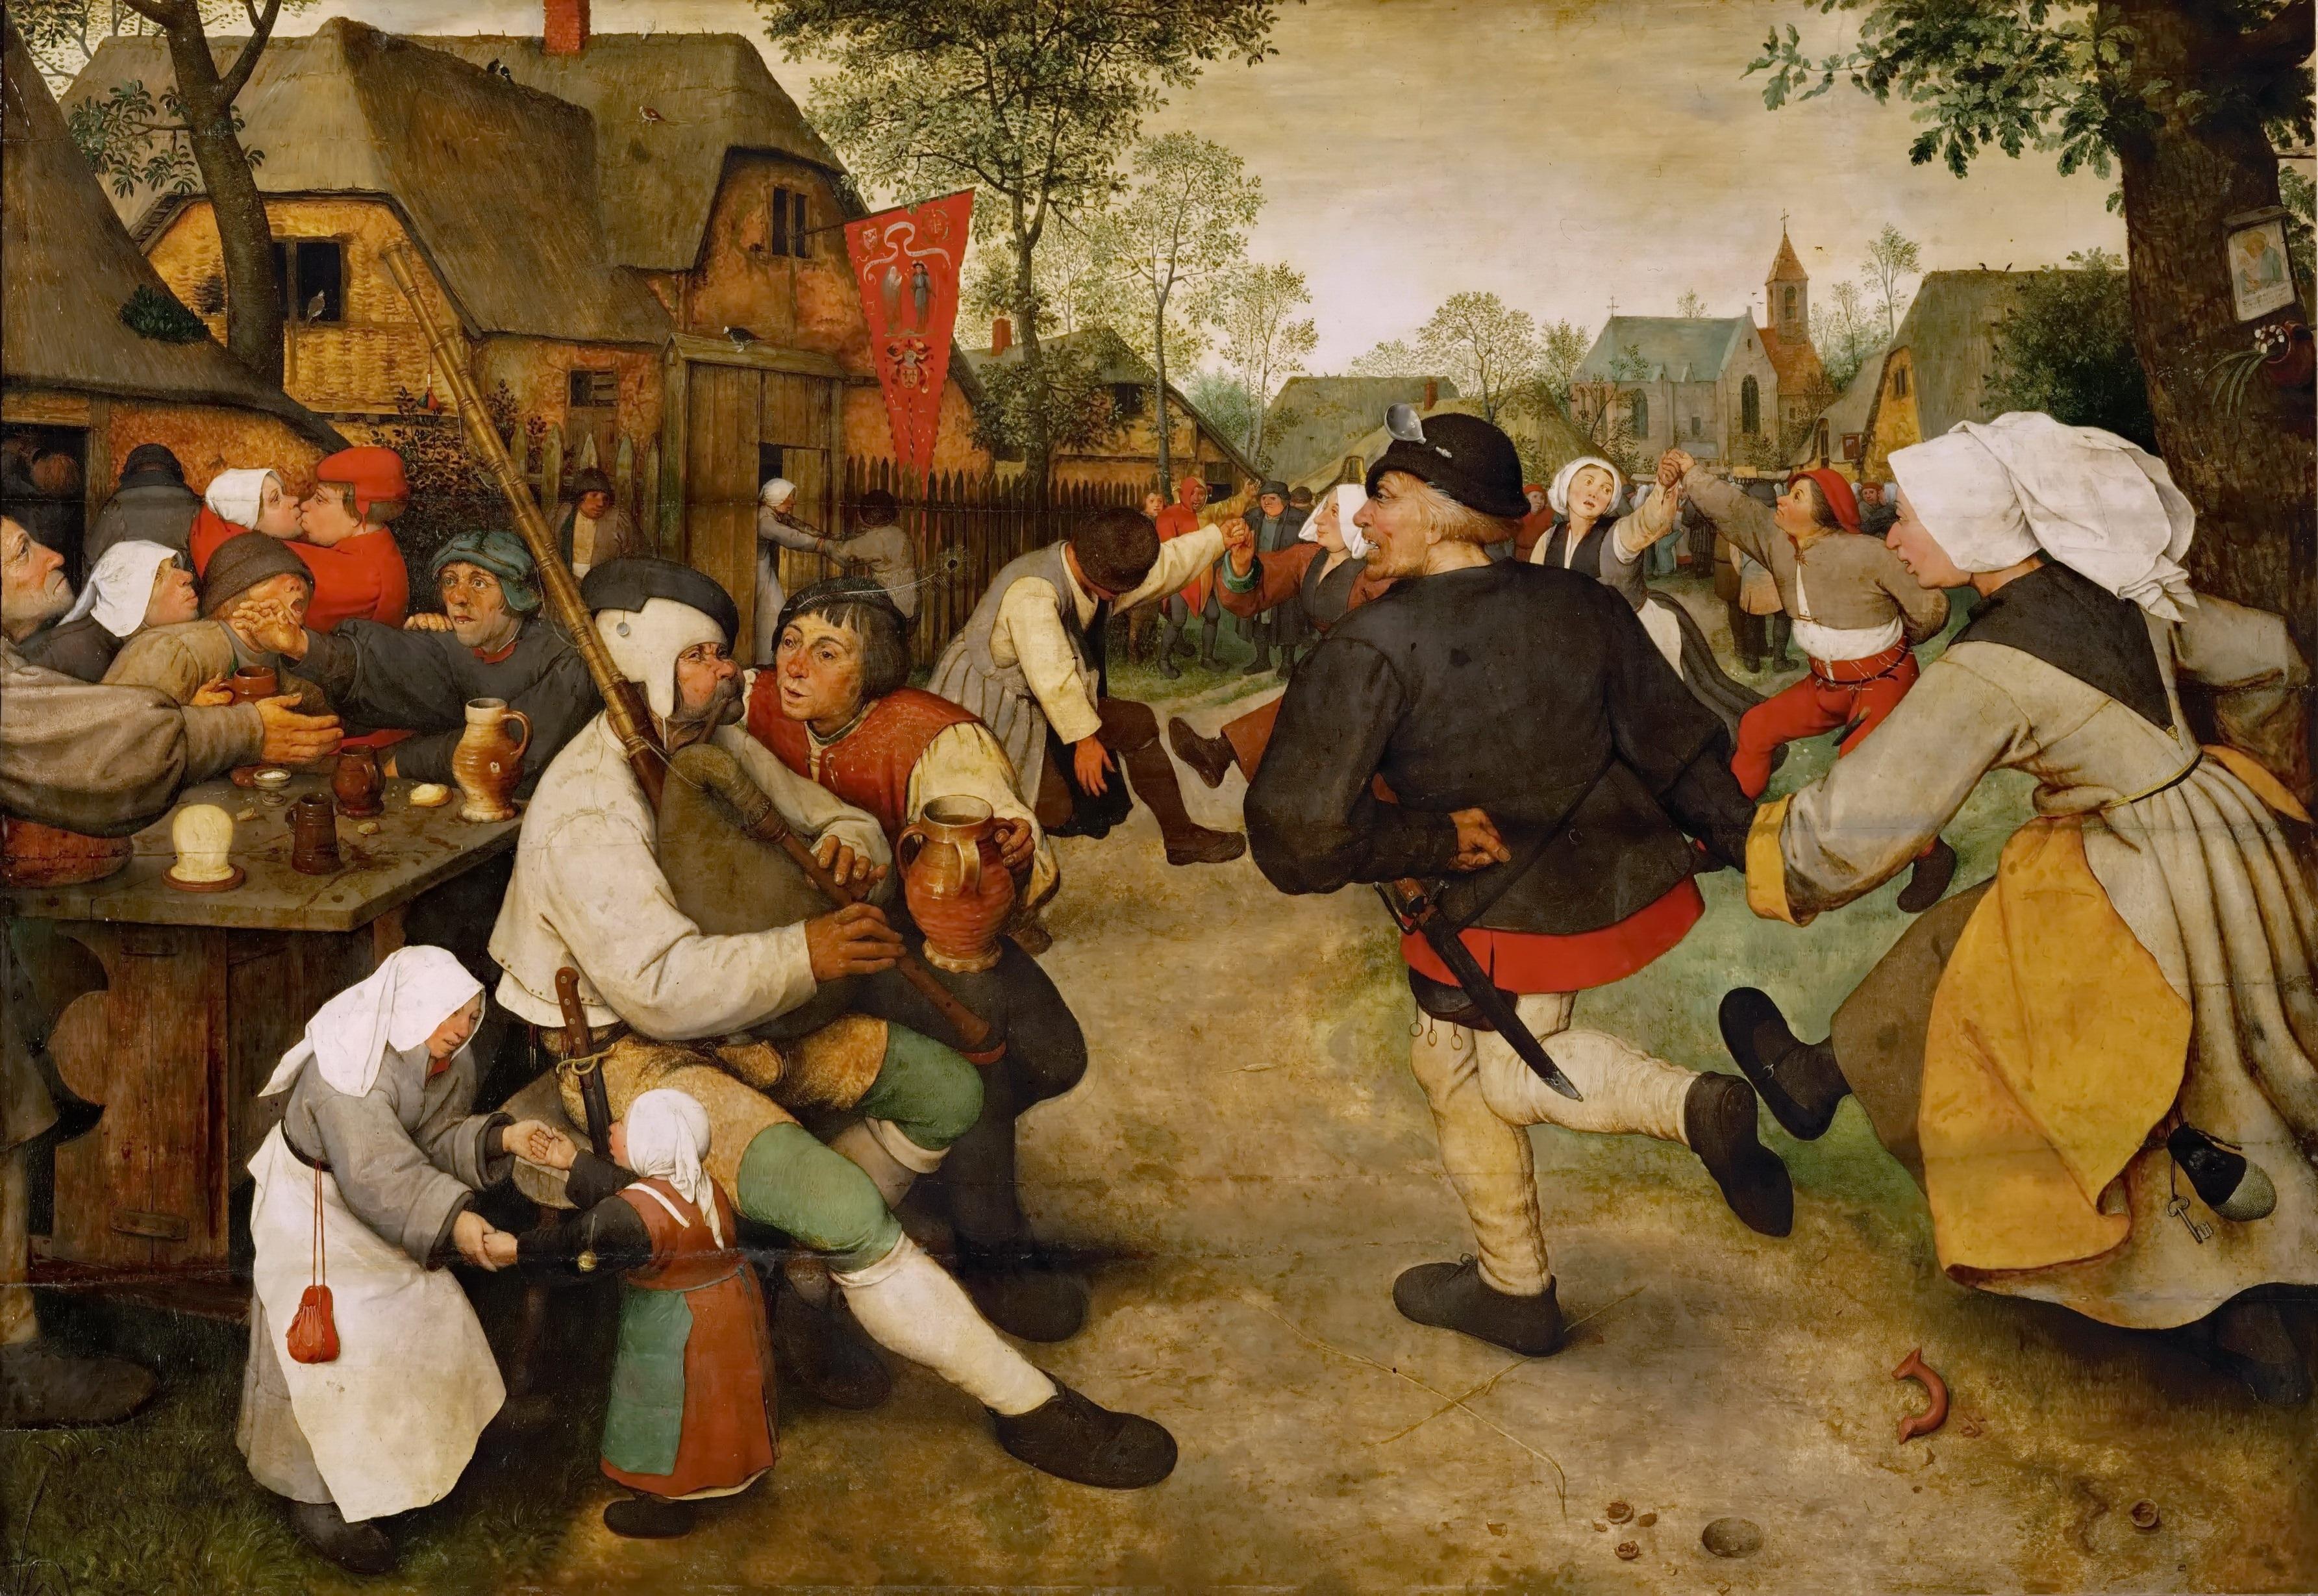 upload.wikimedia.org/wikipedia/commons/2/24/Pieter_Bruegel_d._%C3%84._014.jpg